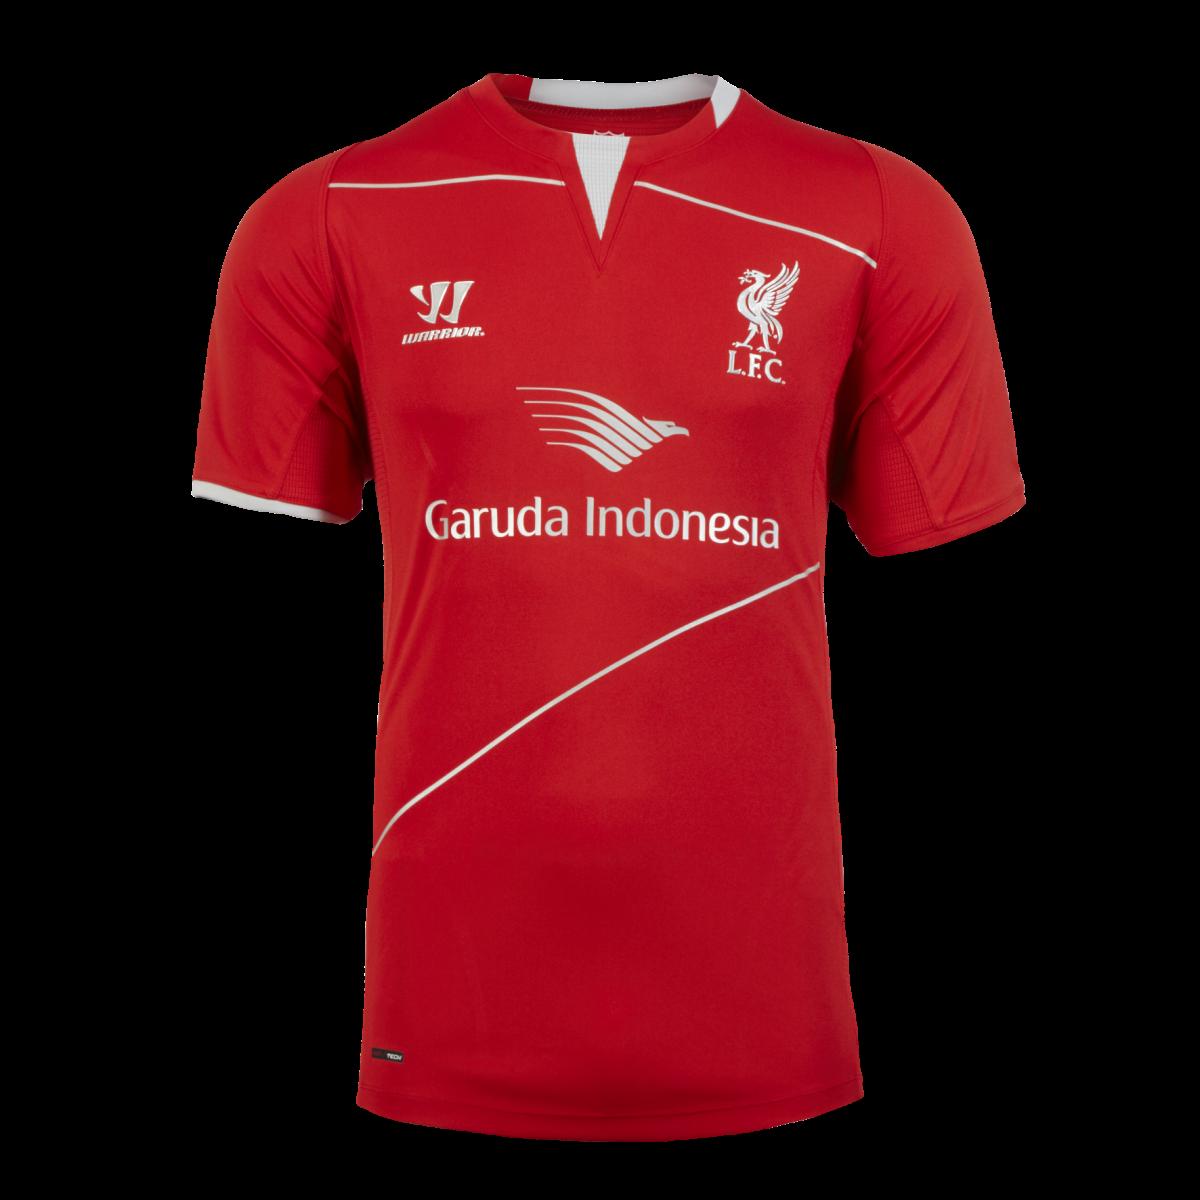 jersey liverpool garuda indonesia 2015 merah